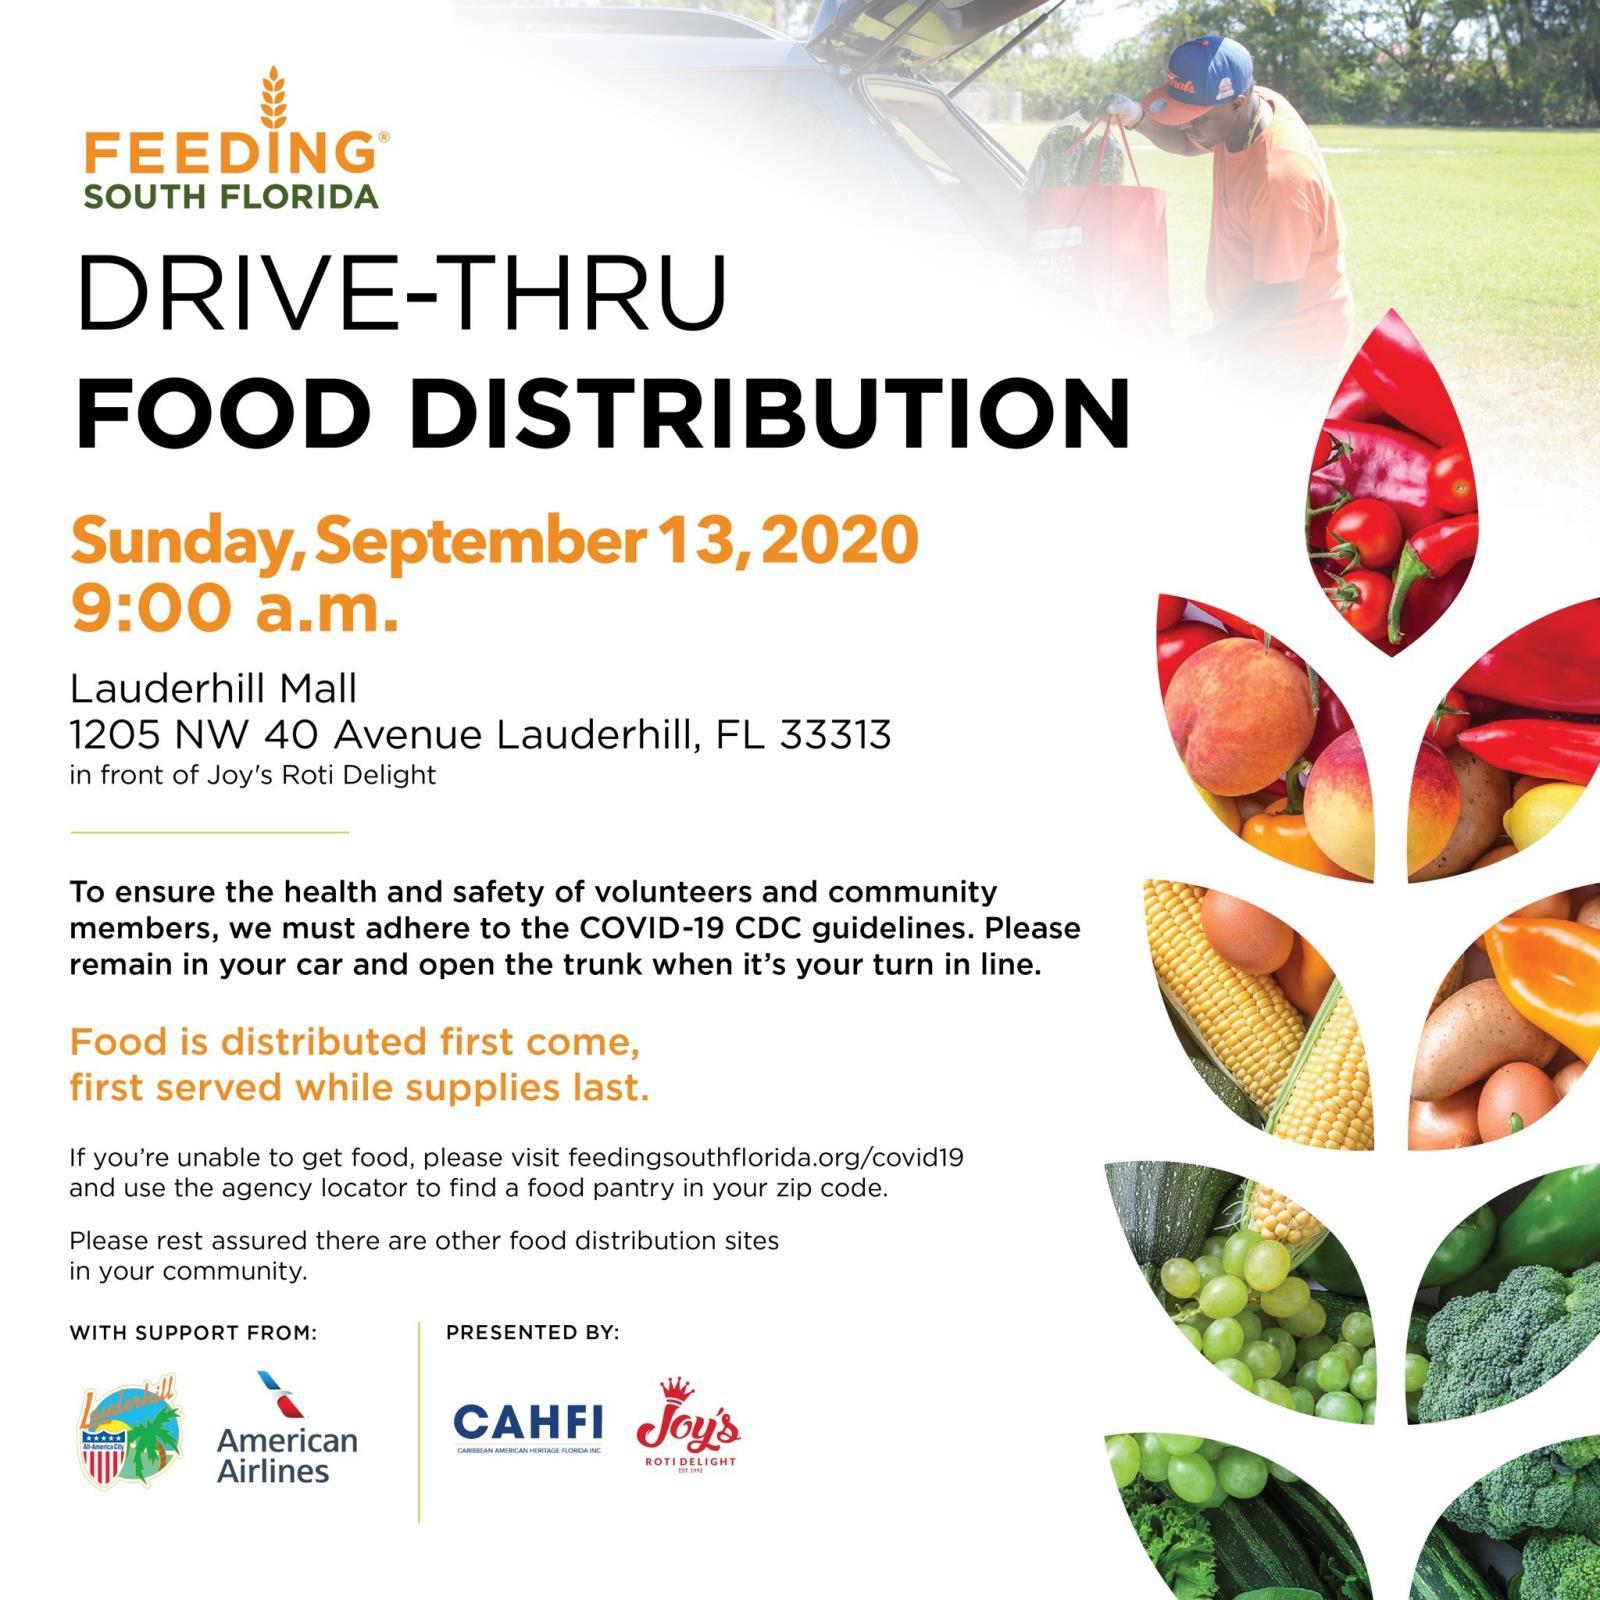 9-13-20 - COVID-19 Drive-Thru Food Distribution - Joy''s Roti Event Flyer